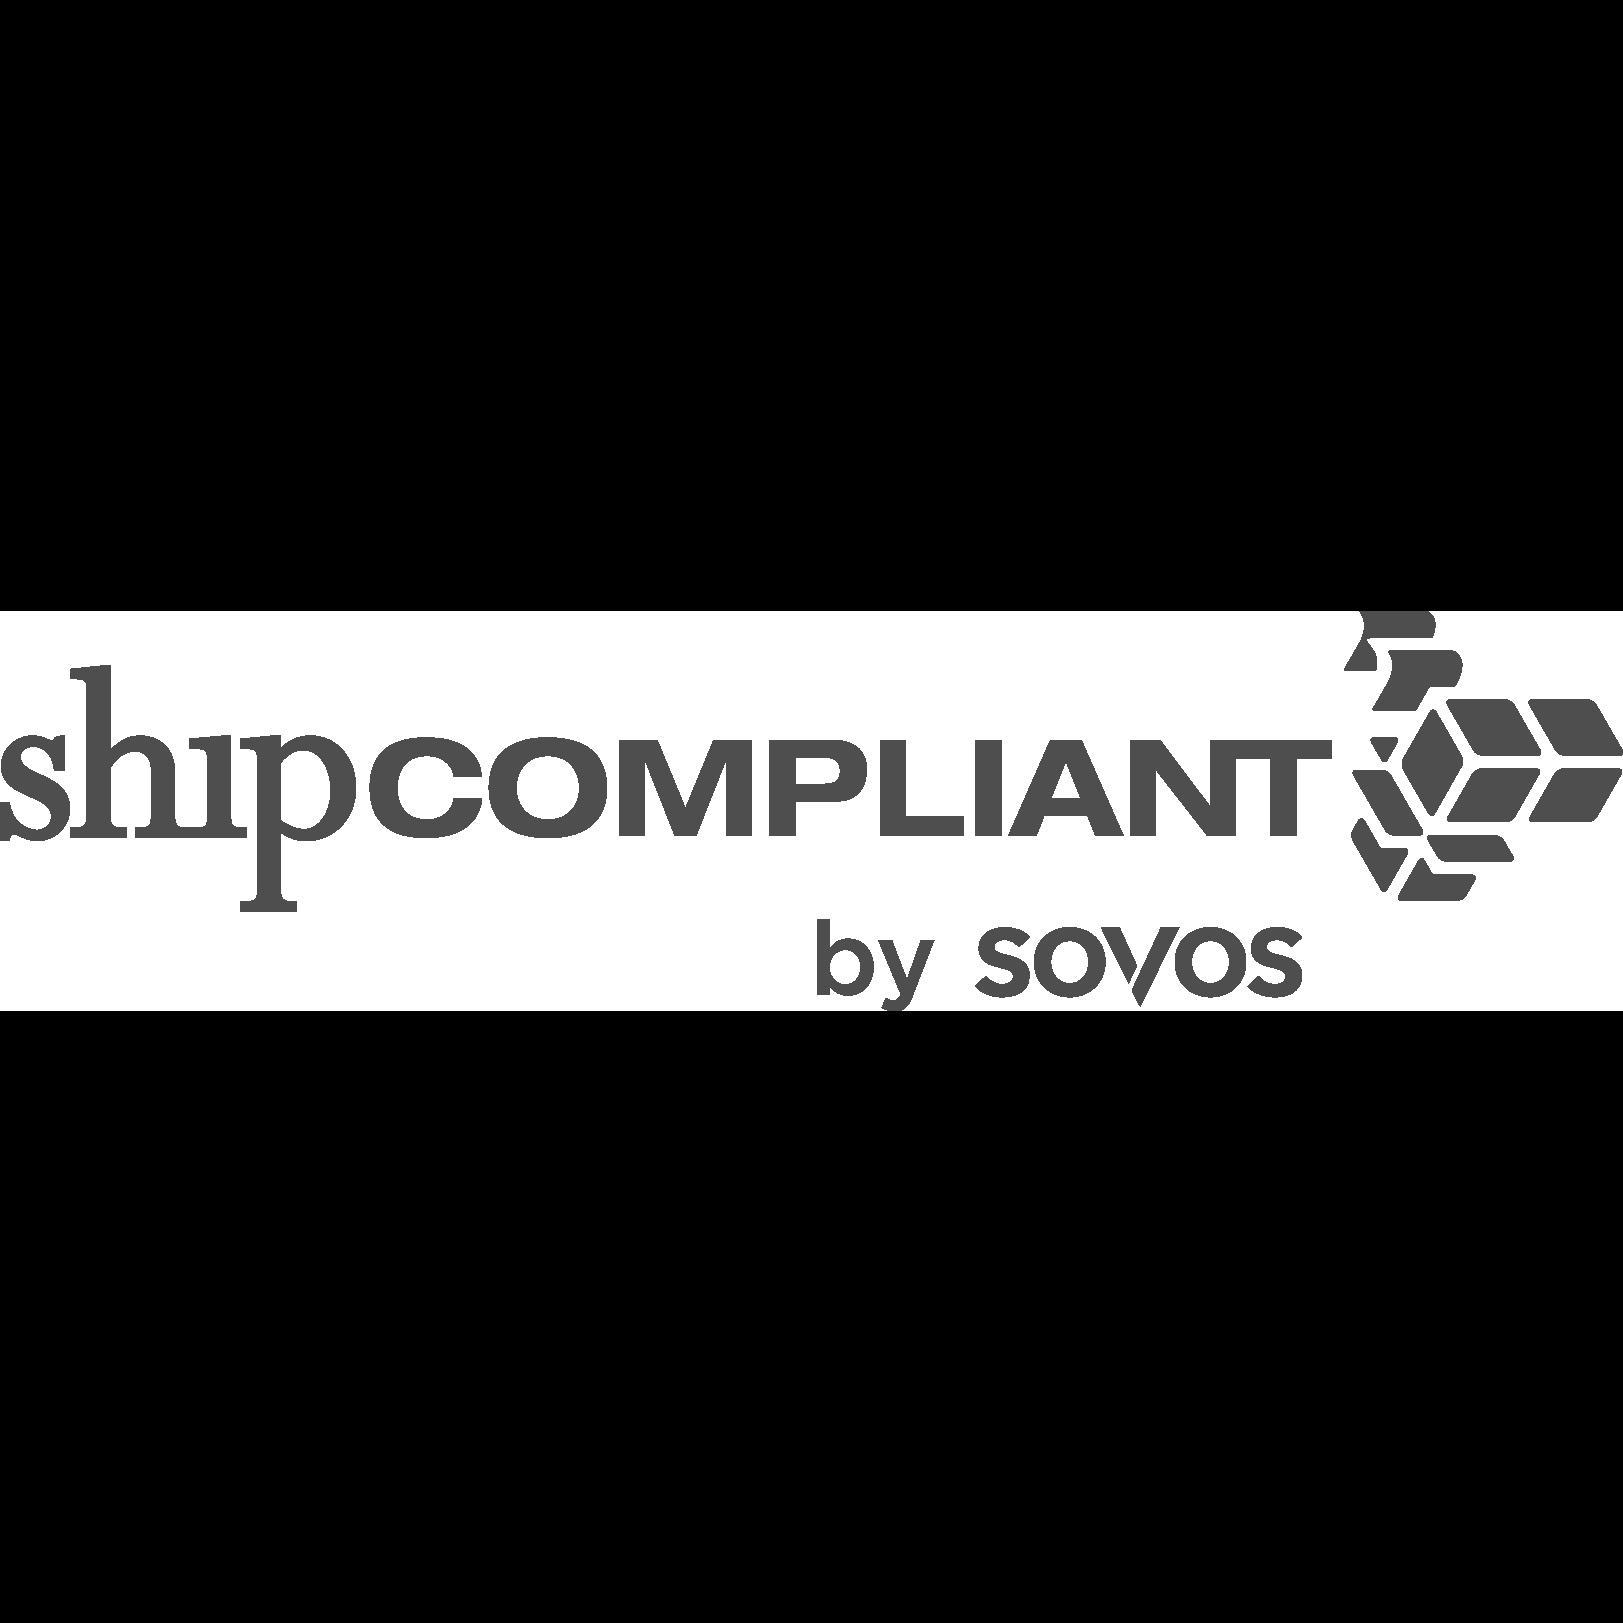 ship-compliant